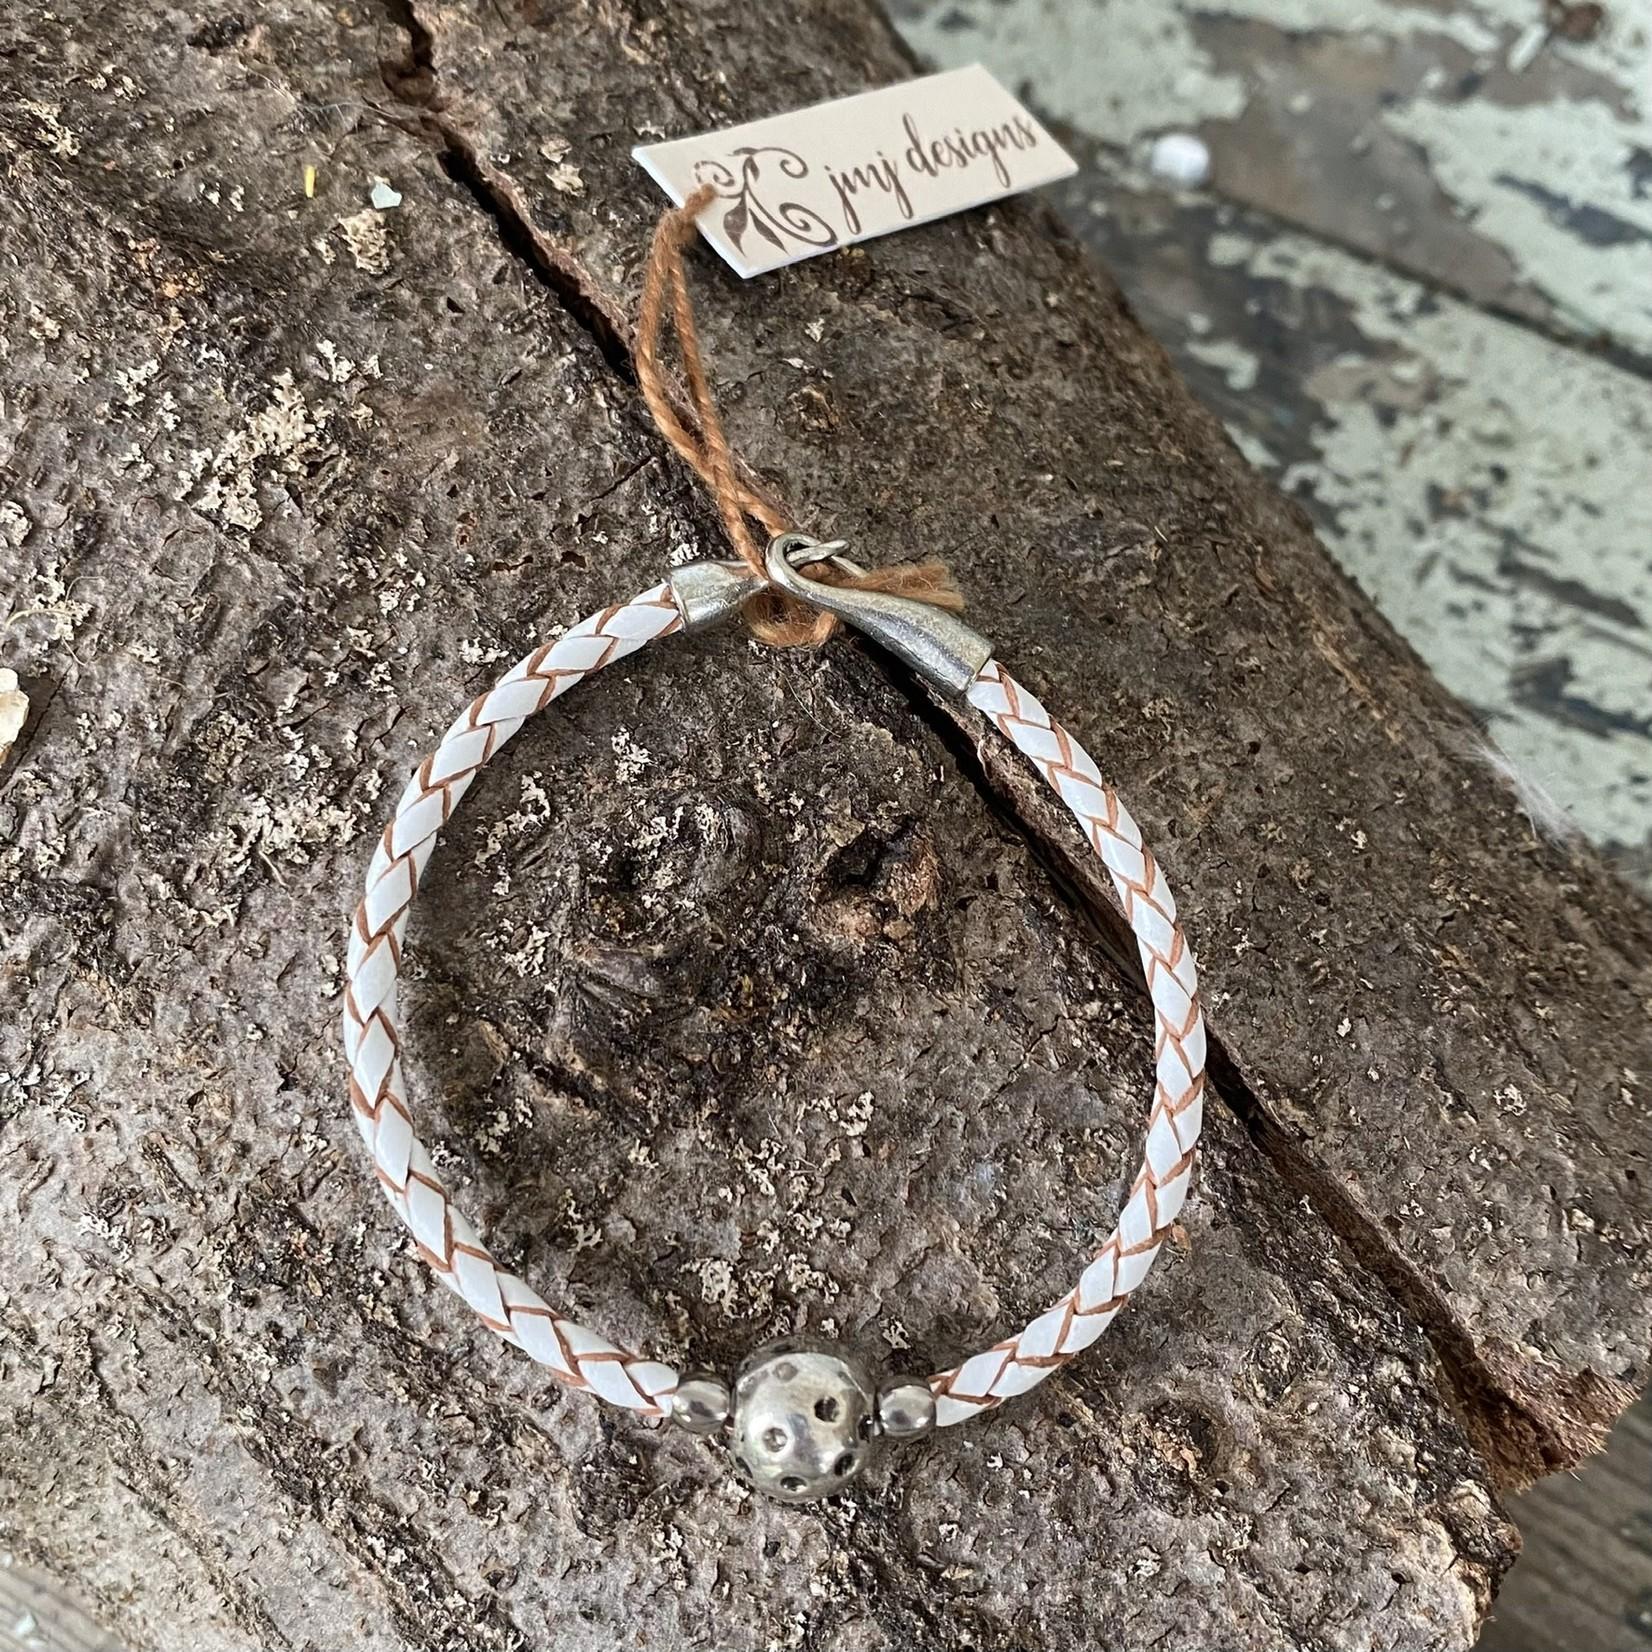 Julia Jones JMJ 921-54 Cream Braided Leather Bracelet -Silver Sphere